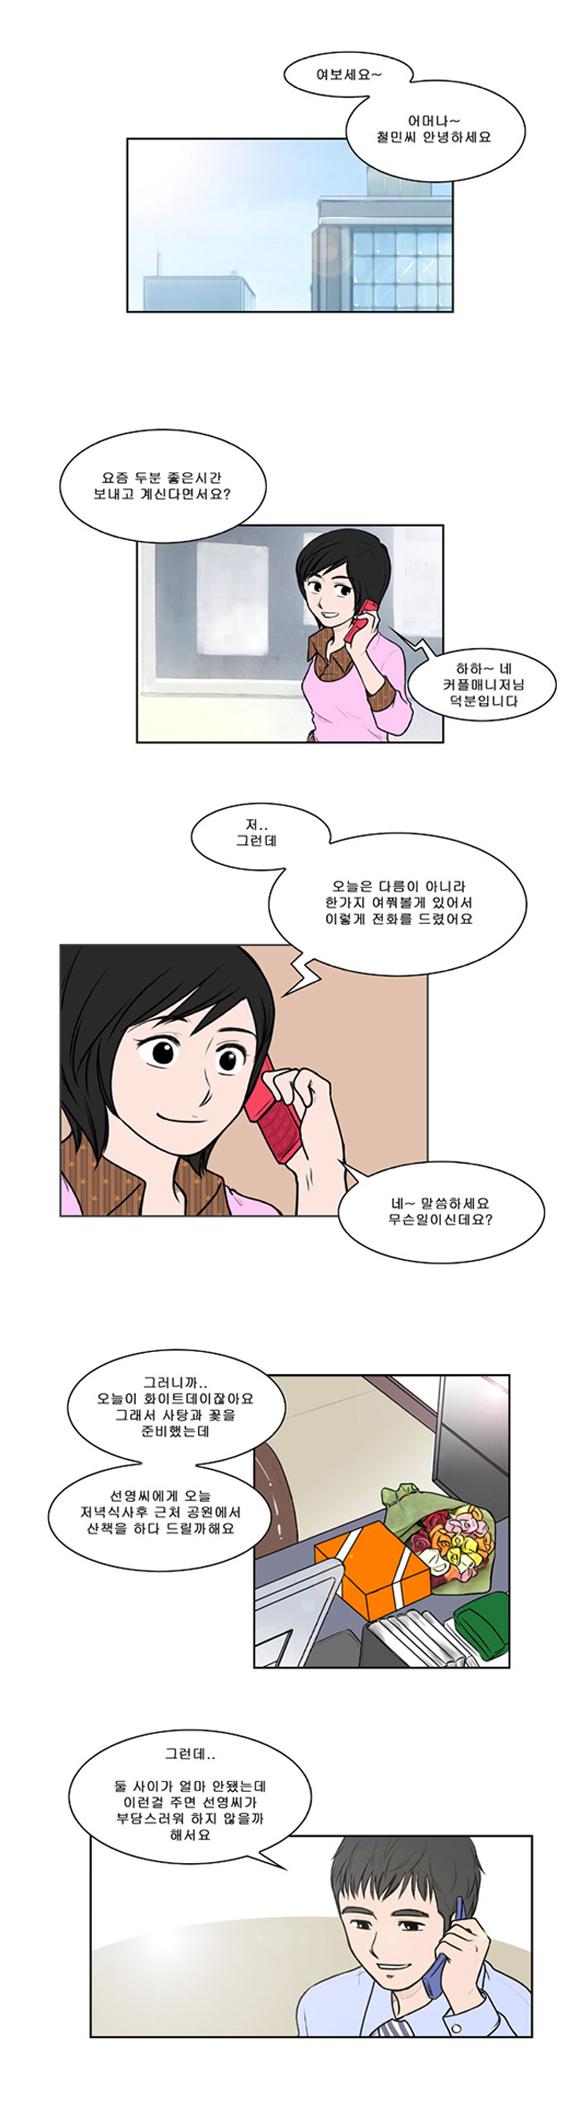 duocartoon_05_01.jpg